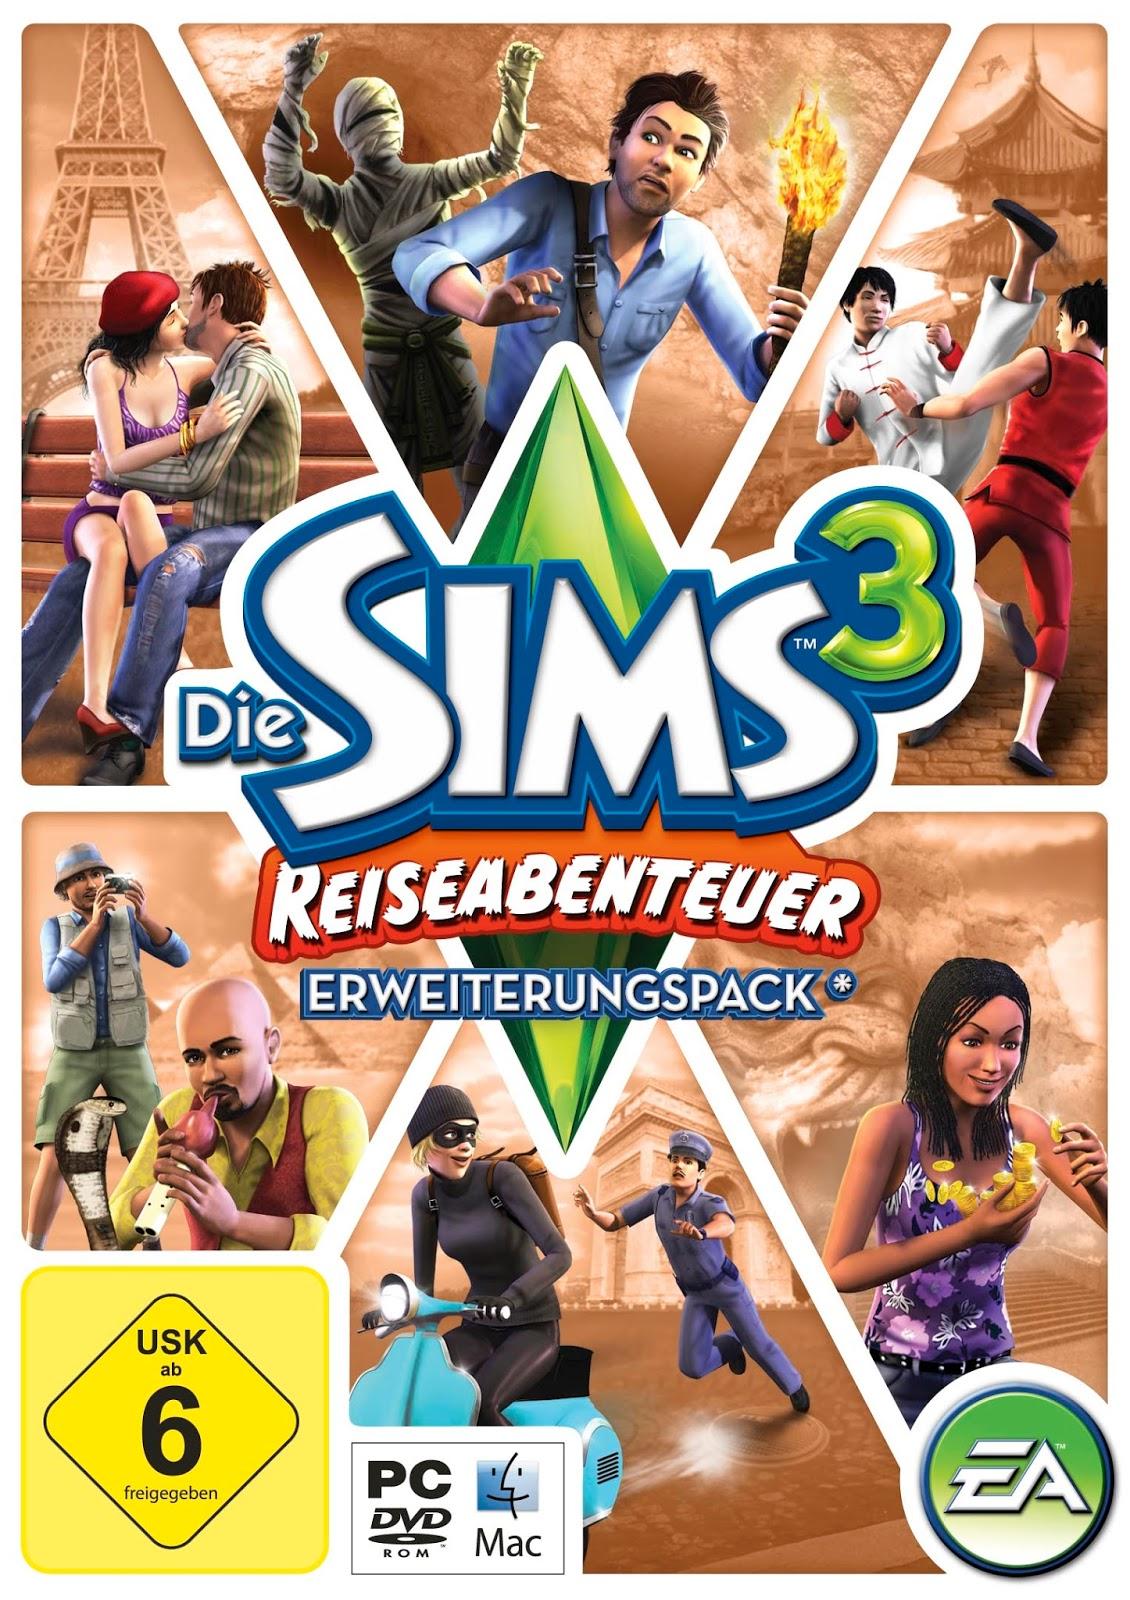 http://www.amazon.de/Die-Sims-Reiseabenteuer-Add-Mac/dp/B002KKCNOO/ref=sr_1_1?ie=UTF8&qid=1405939935&sr=8-1&keywords=die+sims+3+reiseabenteuer